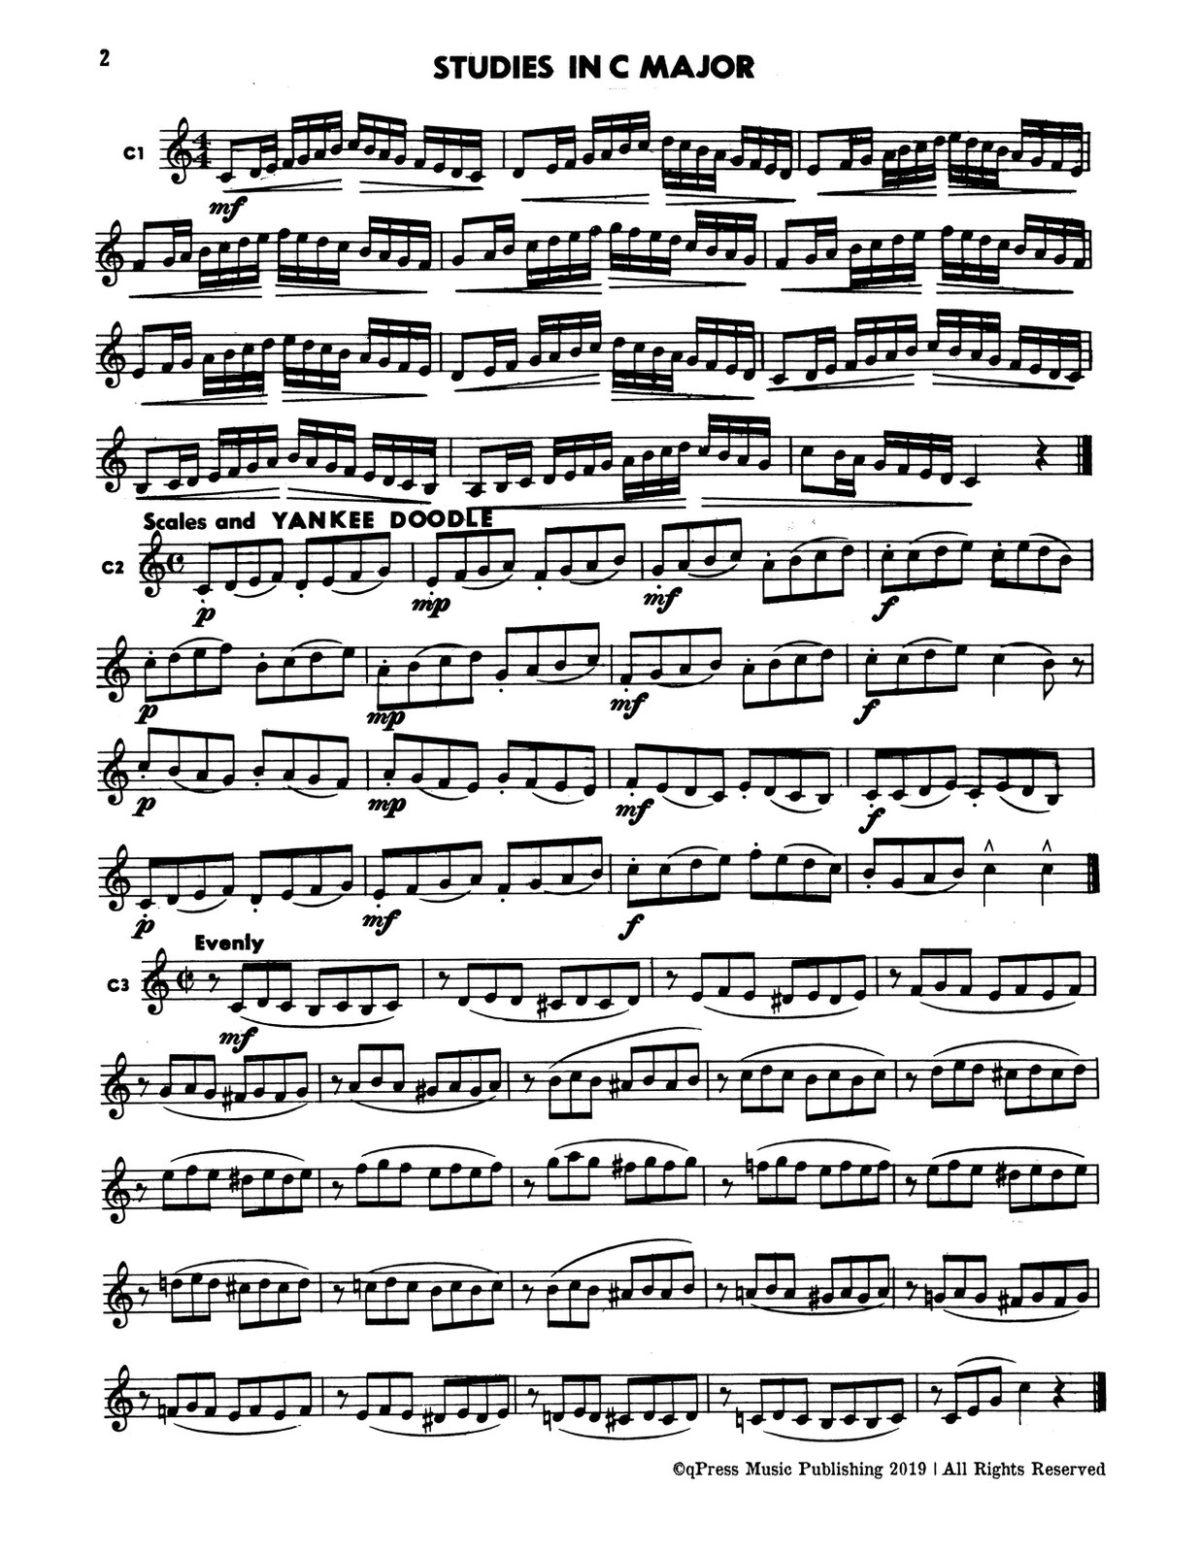 Gornston-Paisner, Fun With Scales for Trumpet-p02